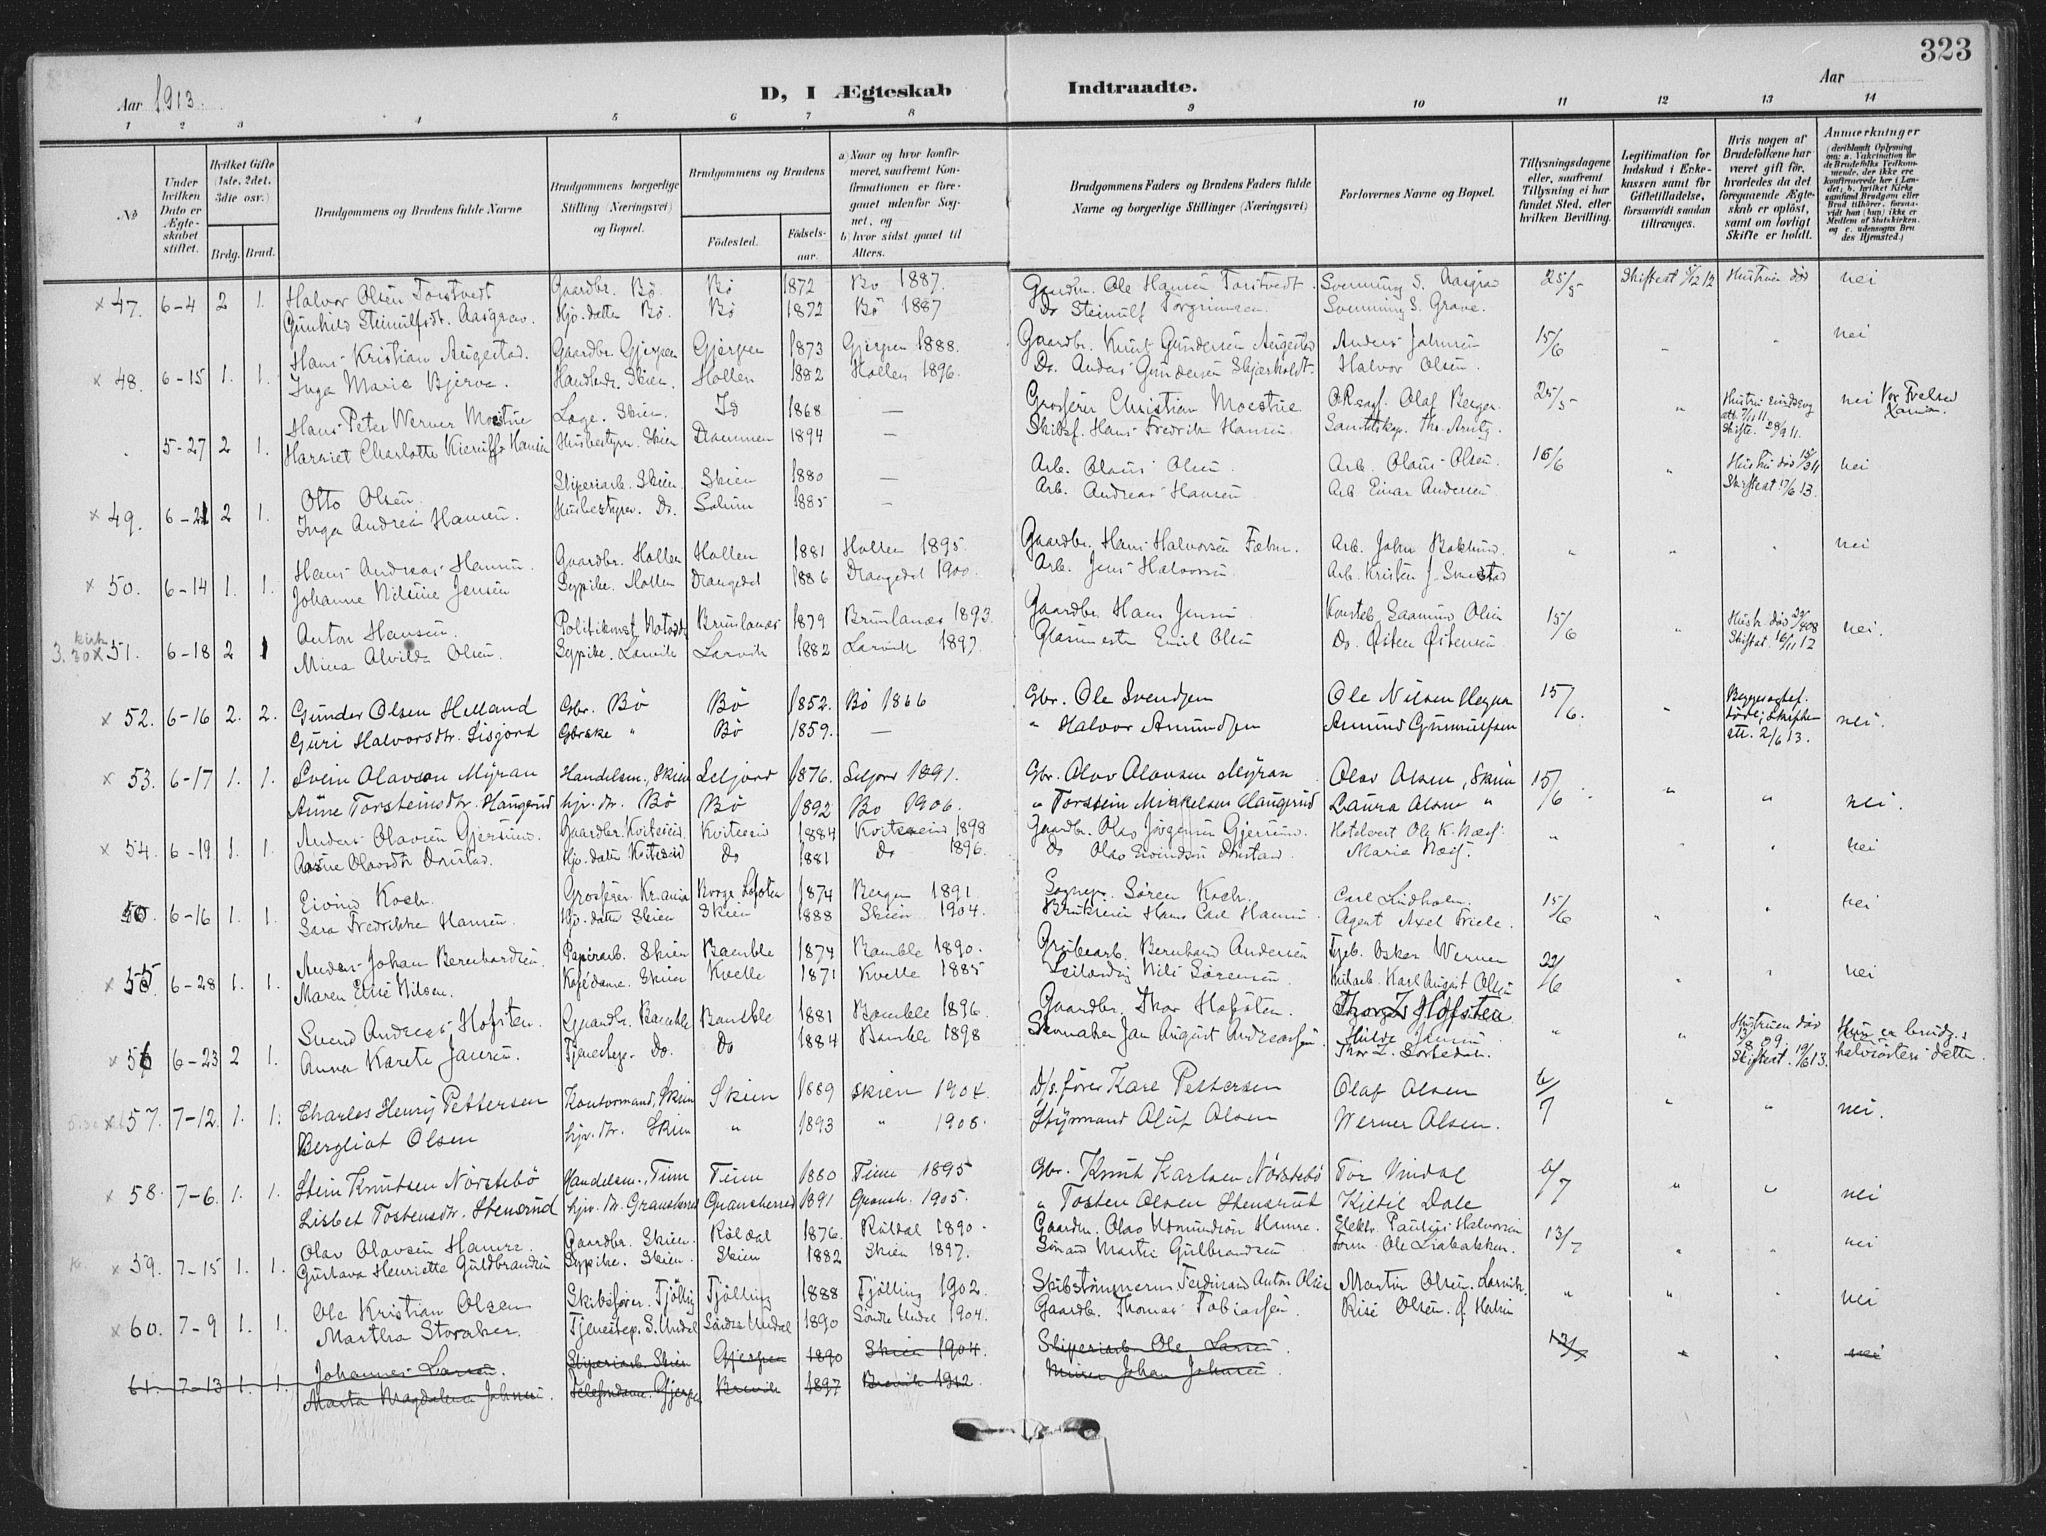 SAKO, Skien kirkebøker, F/Fa/L0012: Parish register (official) no. 12, 1908-1914, p. 323